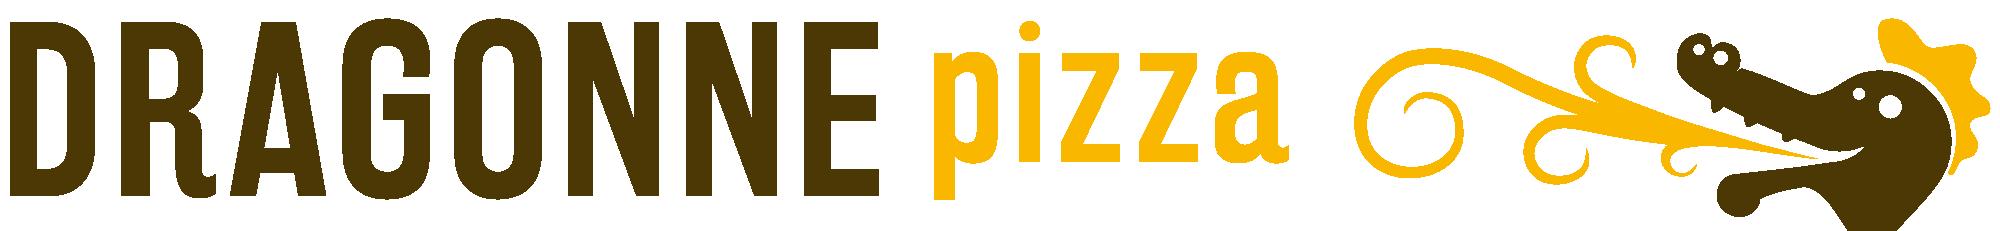 Dragonne Pizza